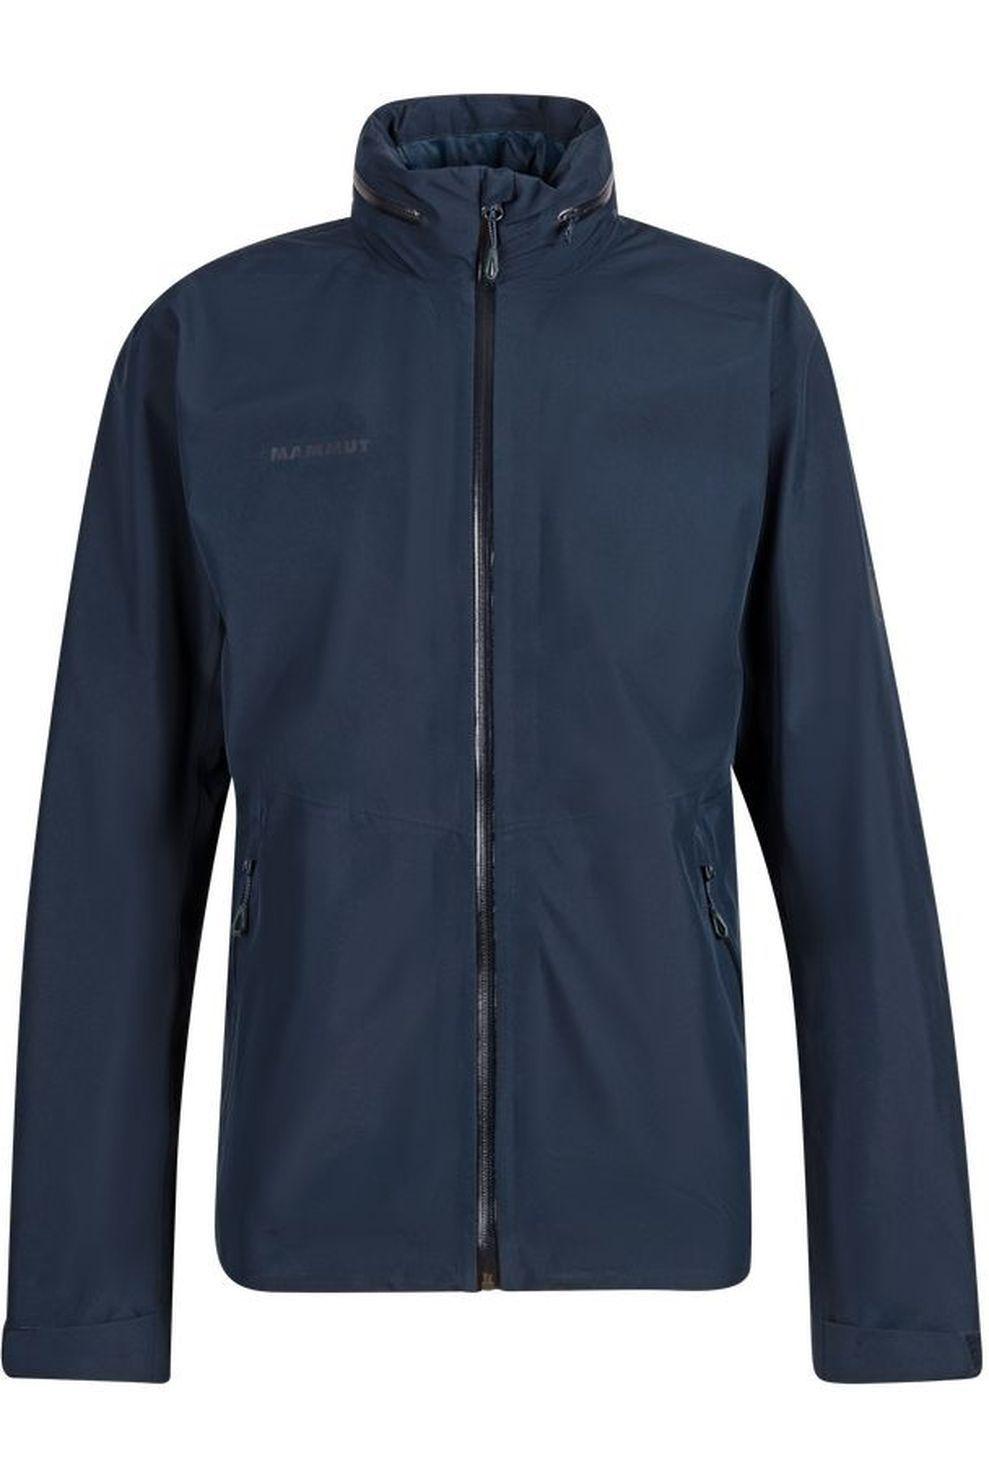 Mammut Jas Ayako Tour Hs Jacket voor heren - Blauw - Maten: M, L, XL